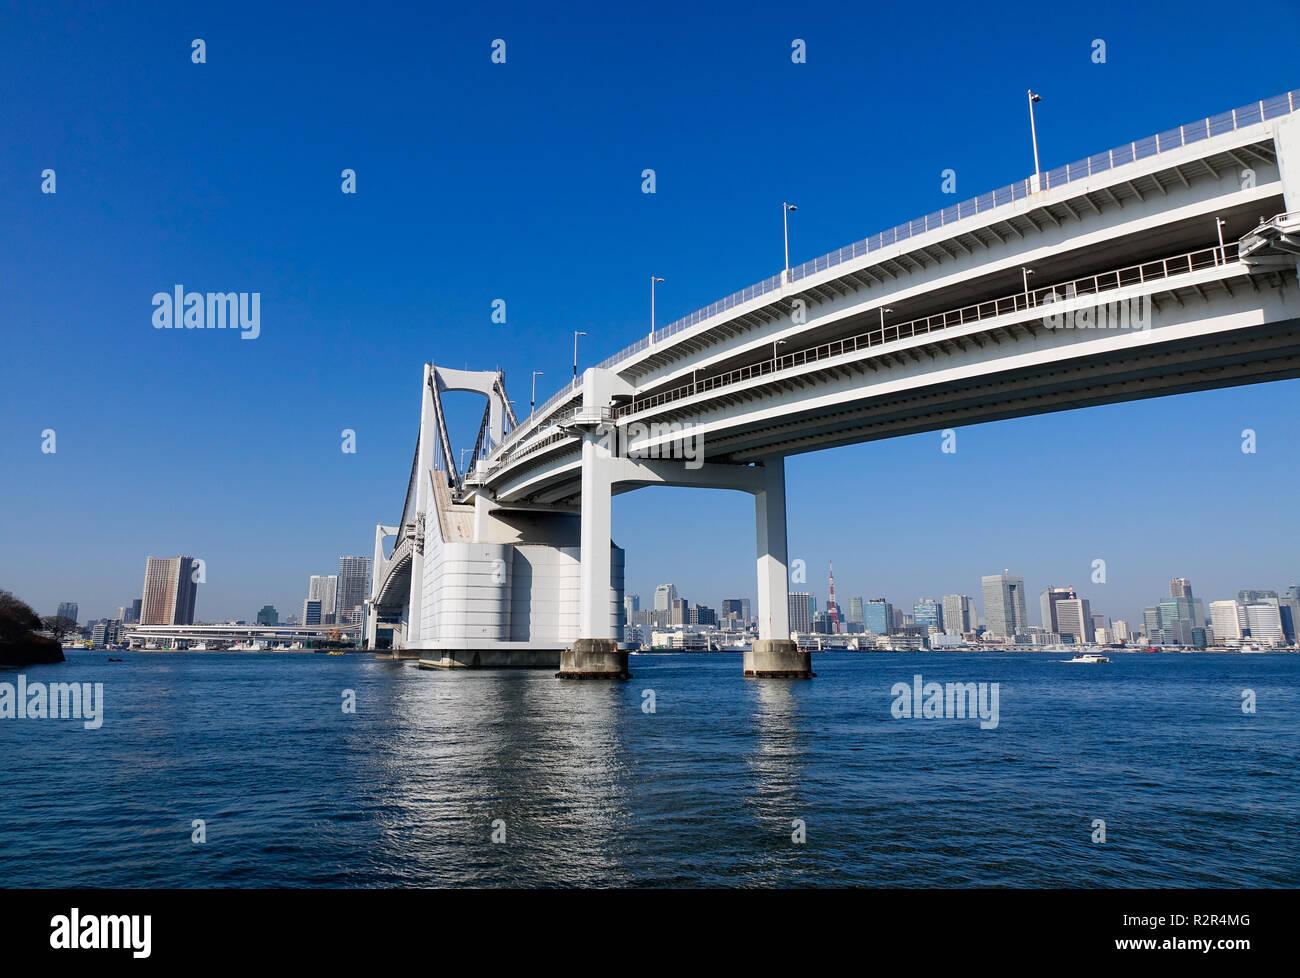 Tokyo, Japan - Jan 4, 2016. Rainbow Bridge and cityscape in Tokyo, Japan. The bridge was built by Kawasaki Heavy Industries, with construction startin Stock Photo